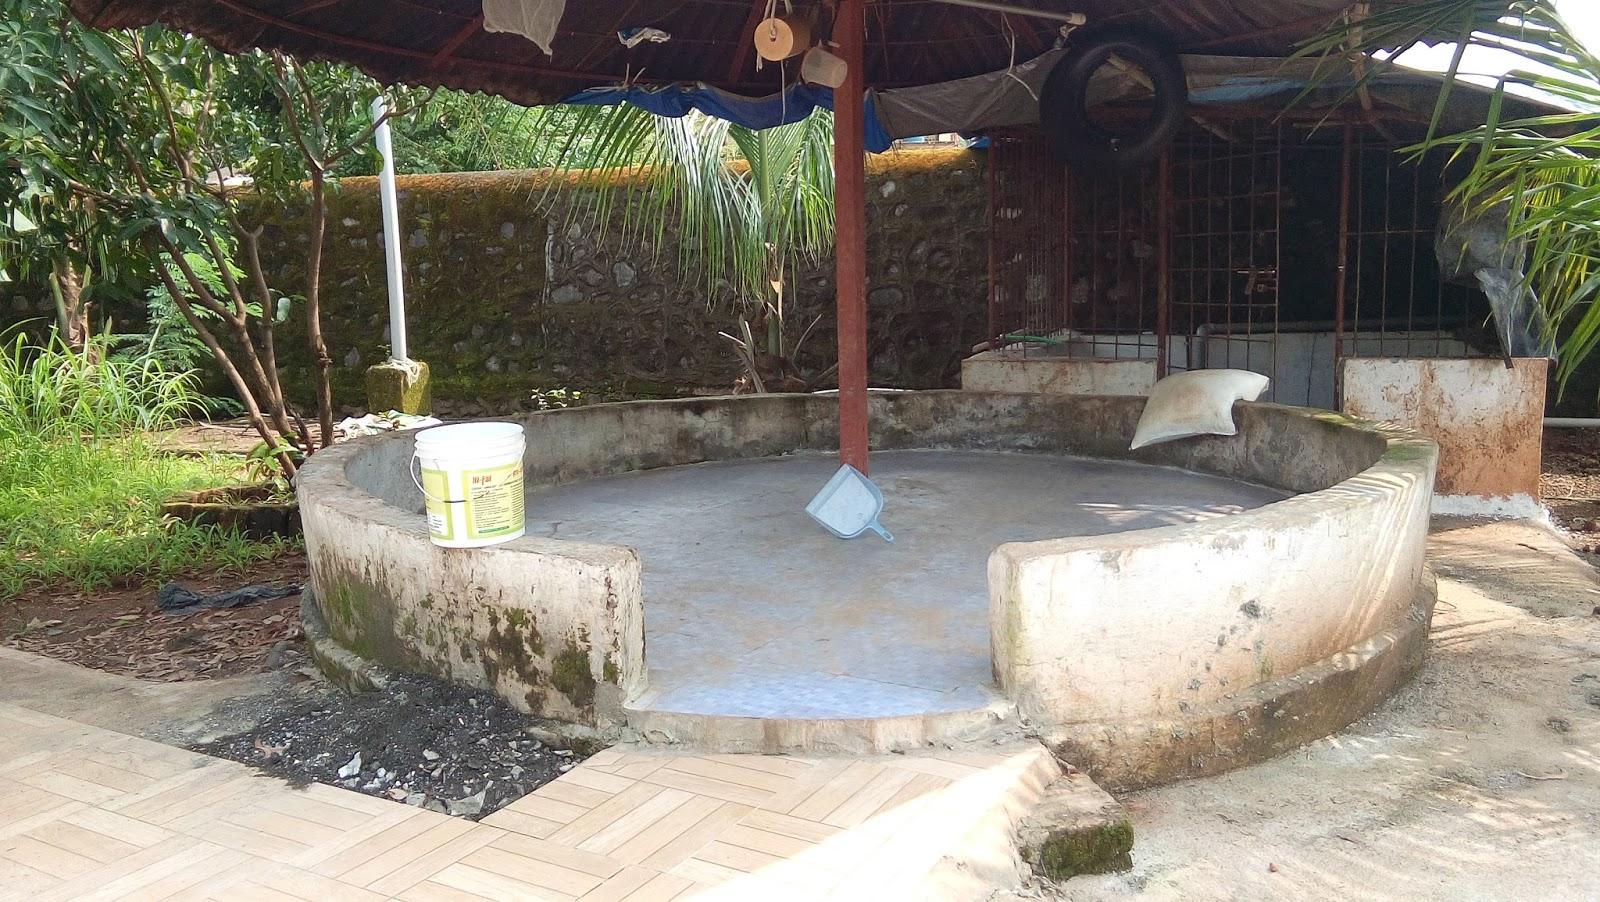 Wwwway2picniccom T D Farm Bungalow Badlapur